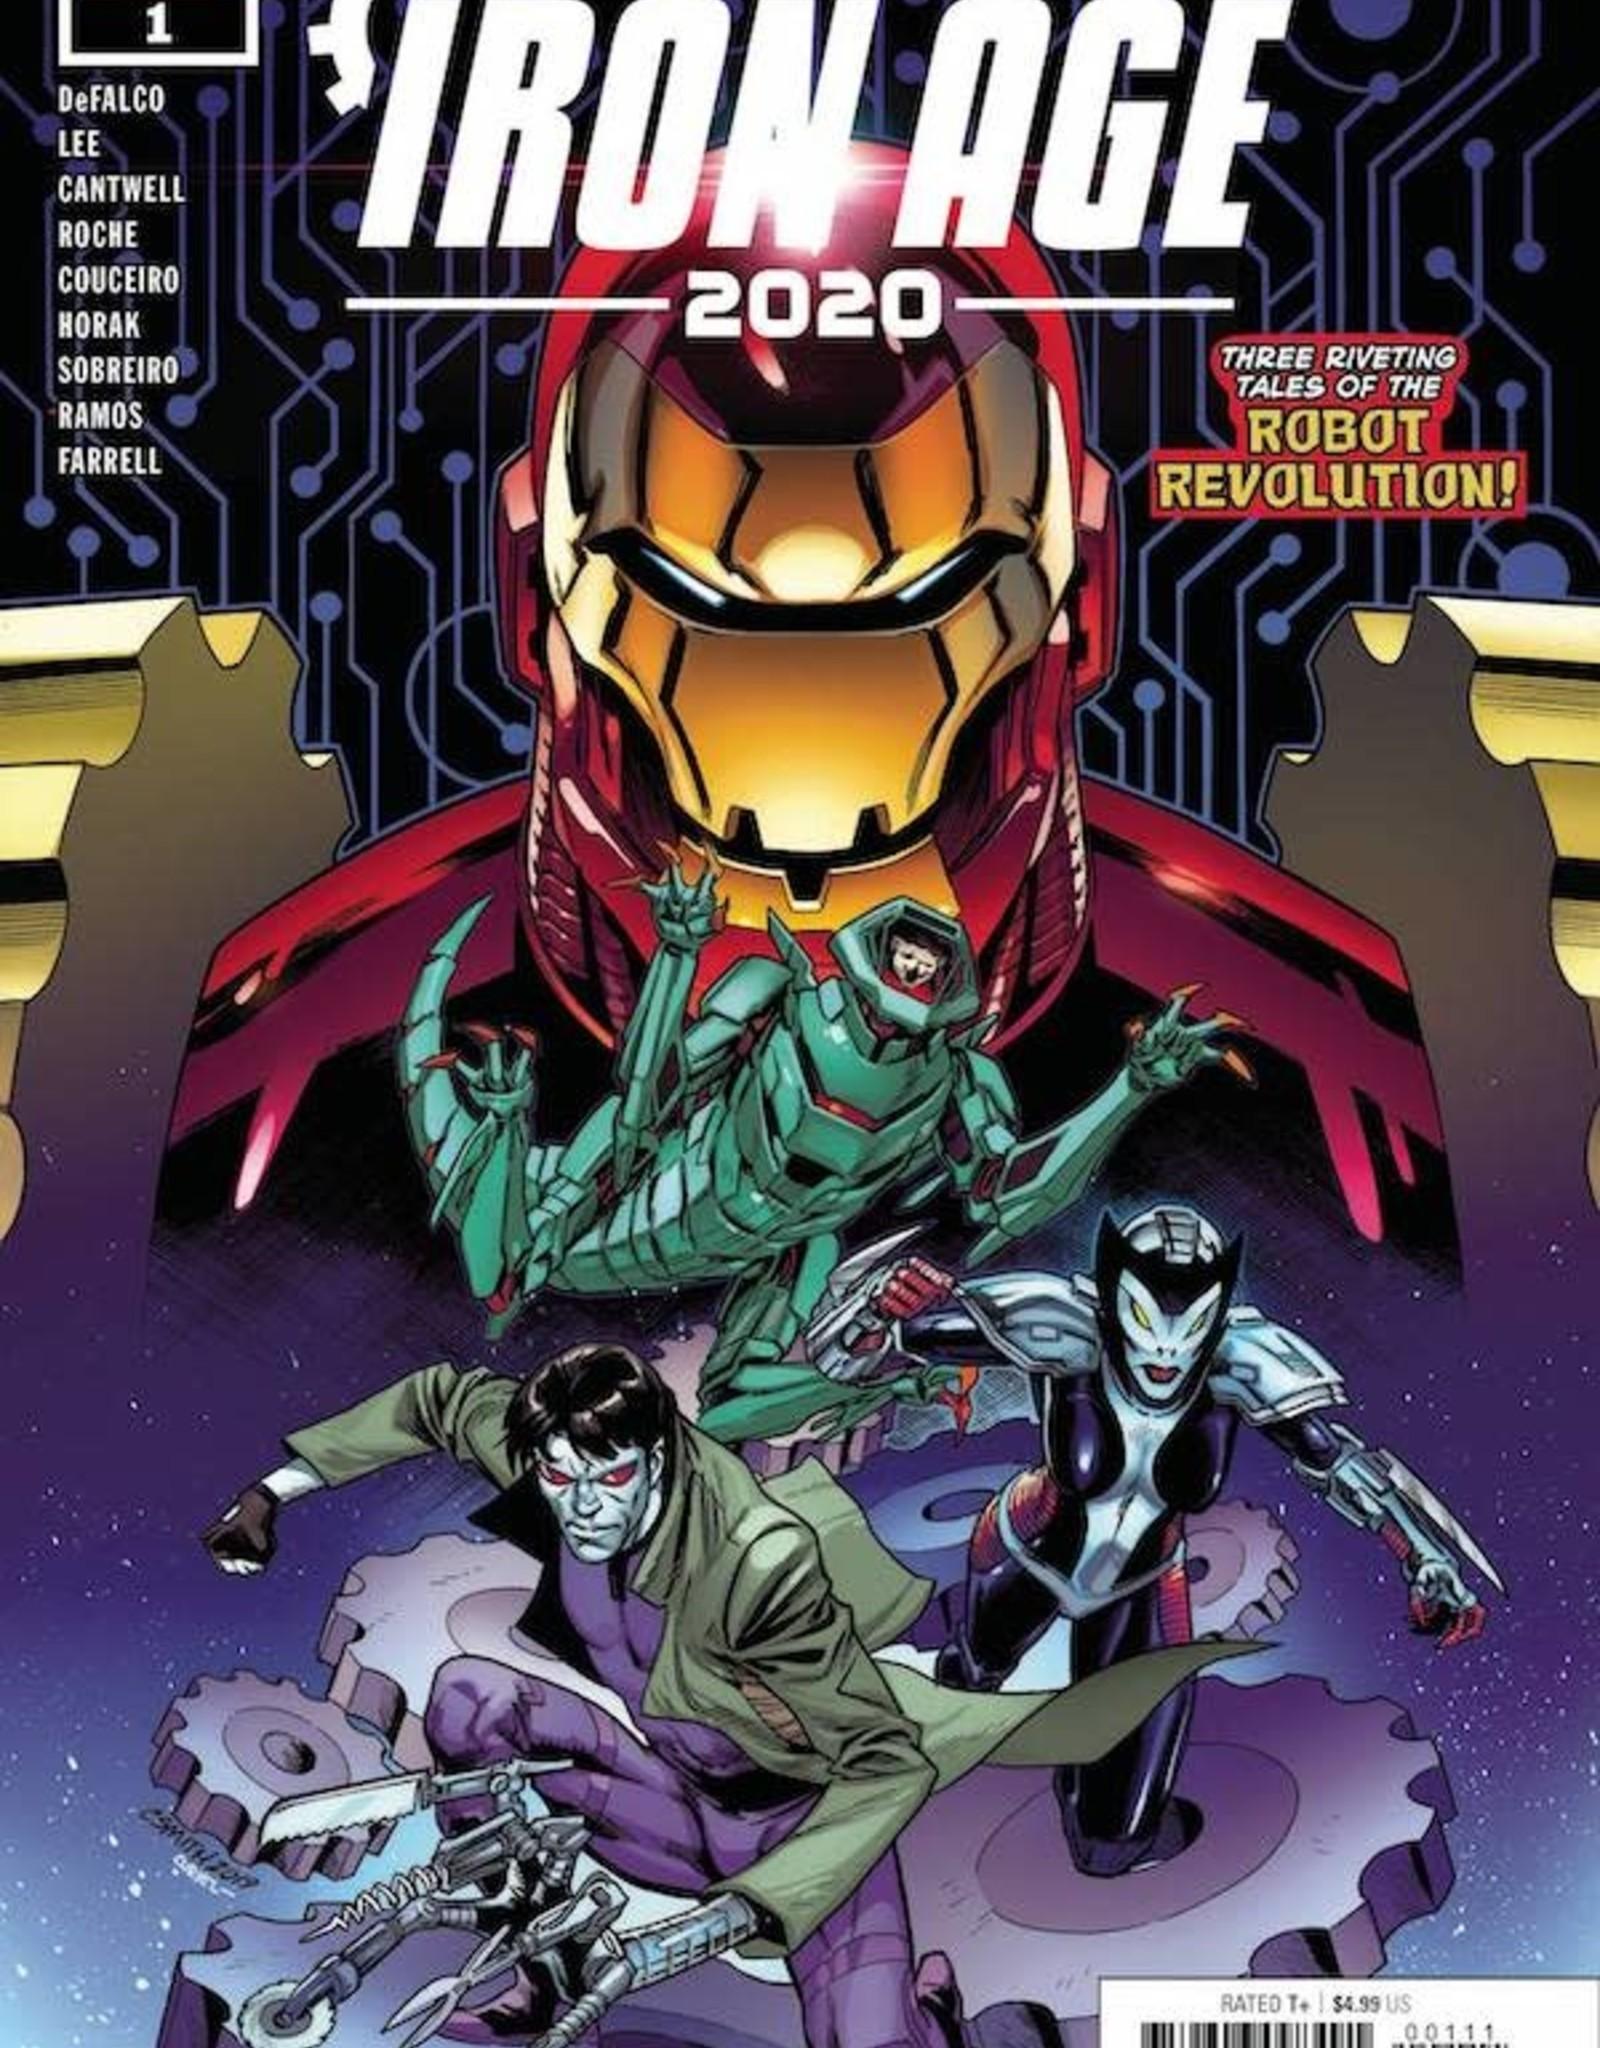 Marvel Comics 2020 Iron Age #1